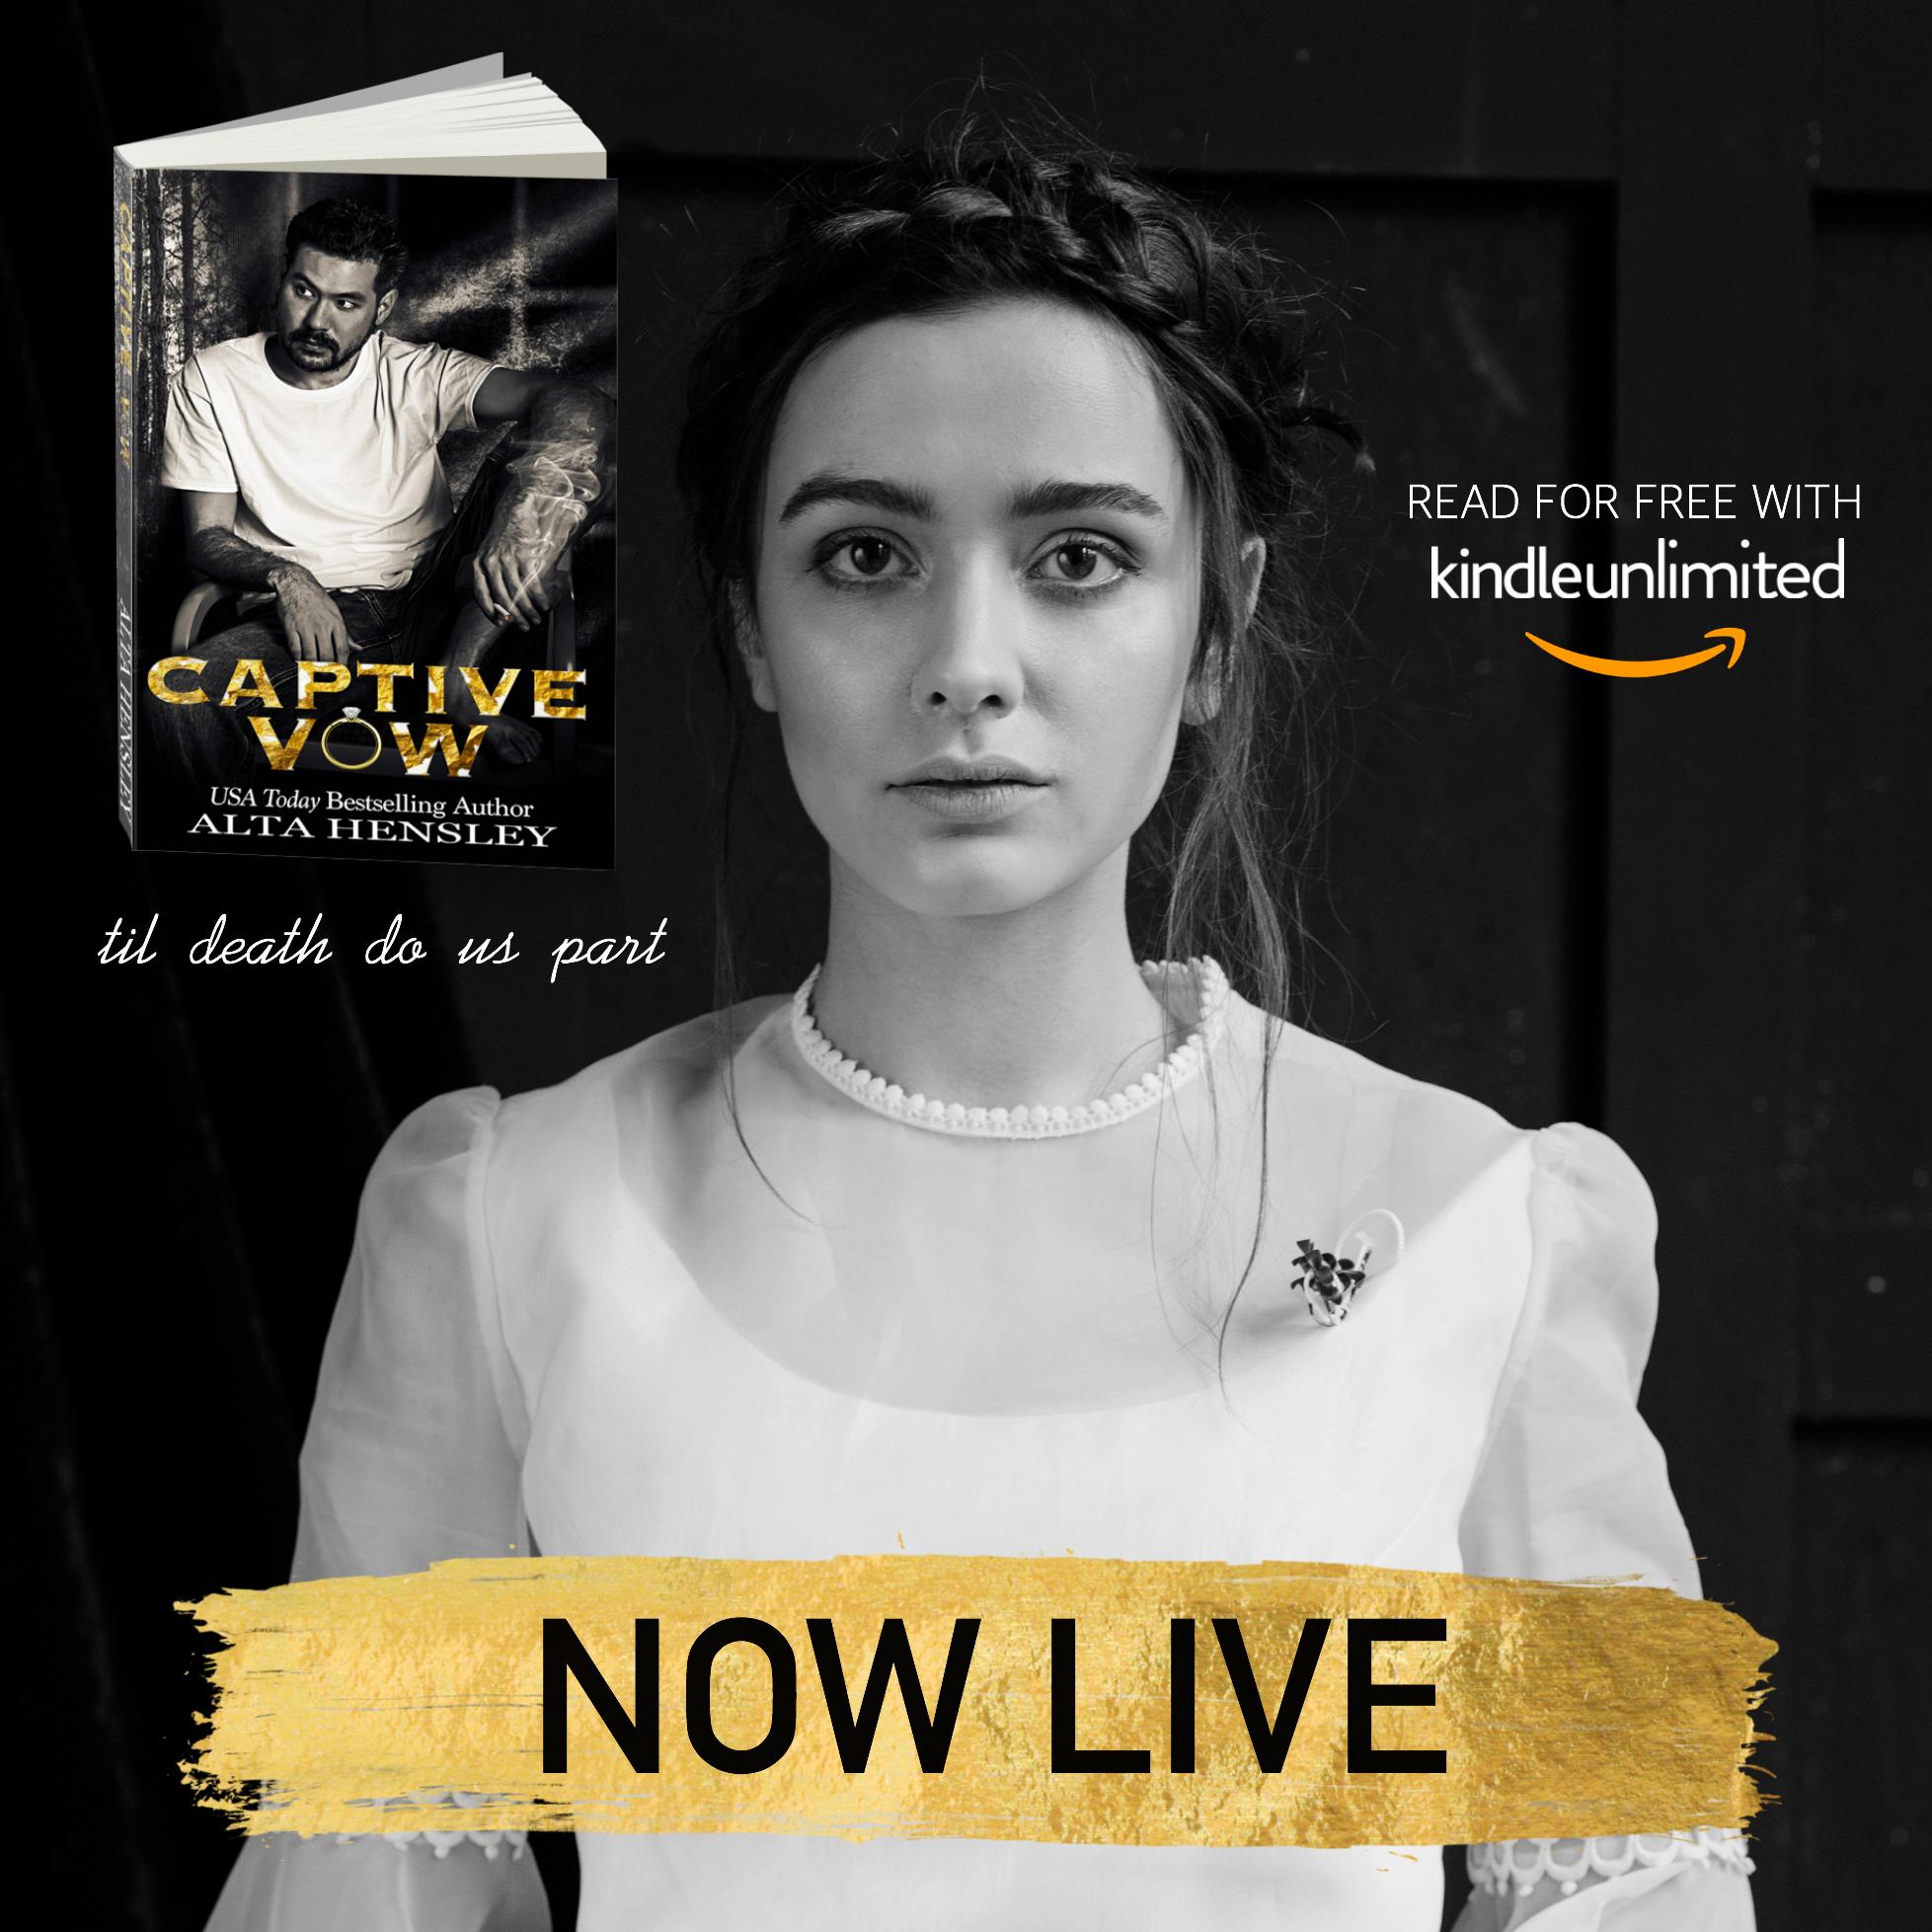 CAPTIVEVOW_NOWLIVE3